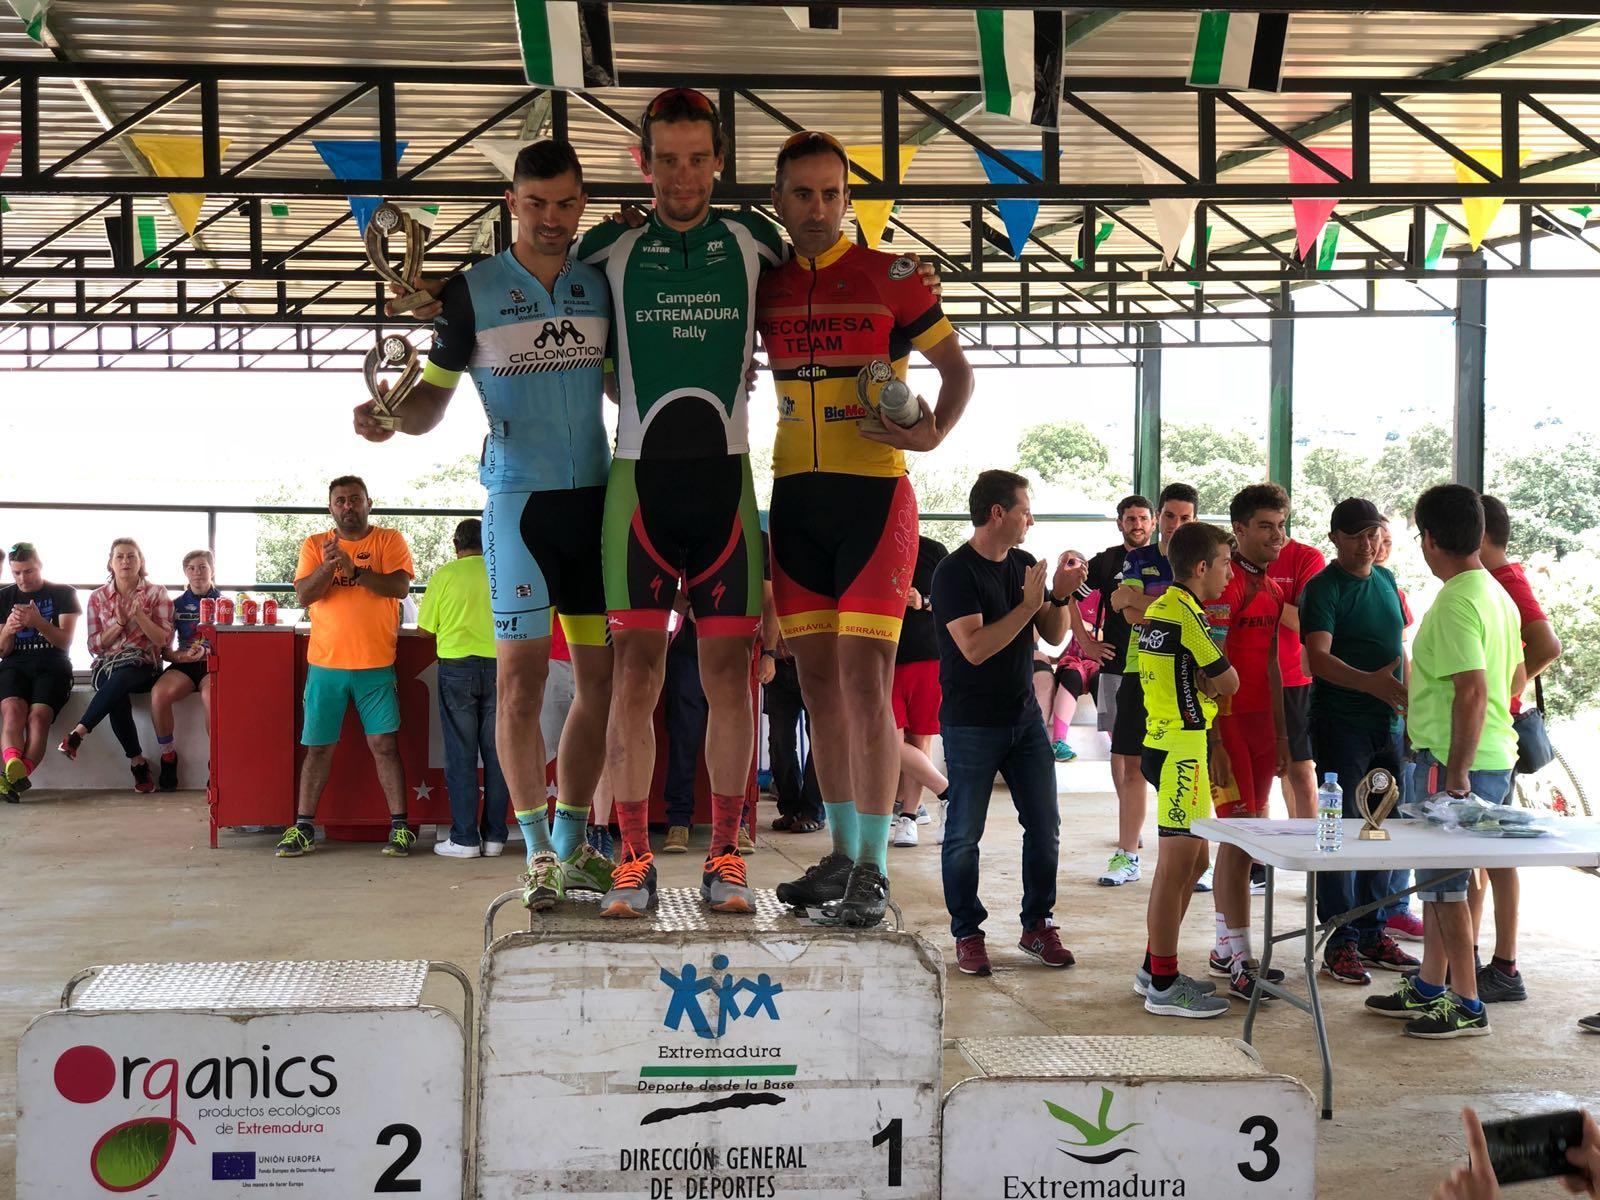 Pedro Romero Campeón de Extremadura XCO (Rally) en categoría élite